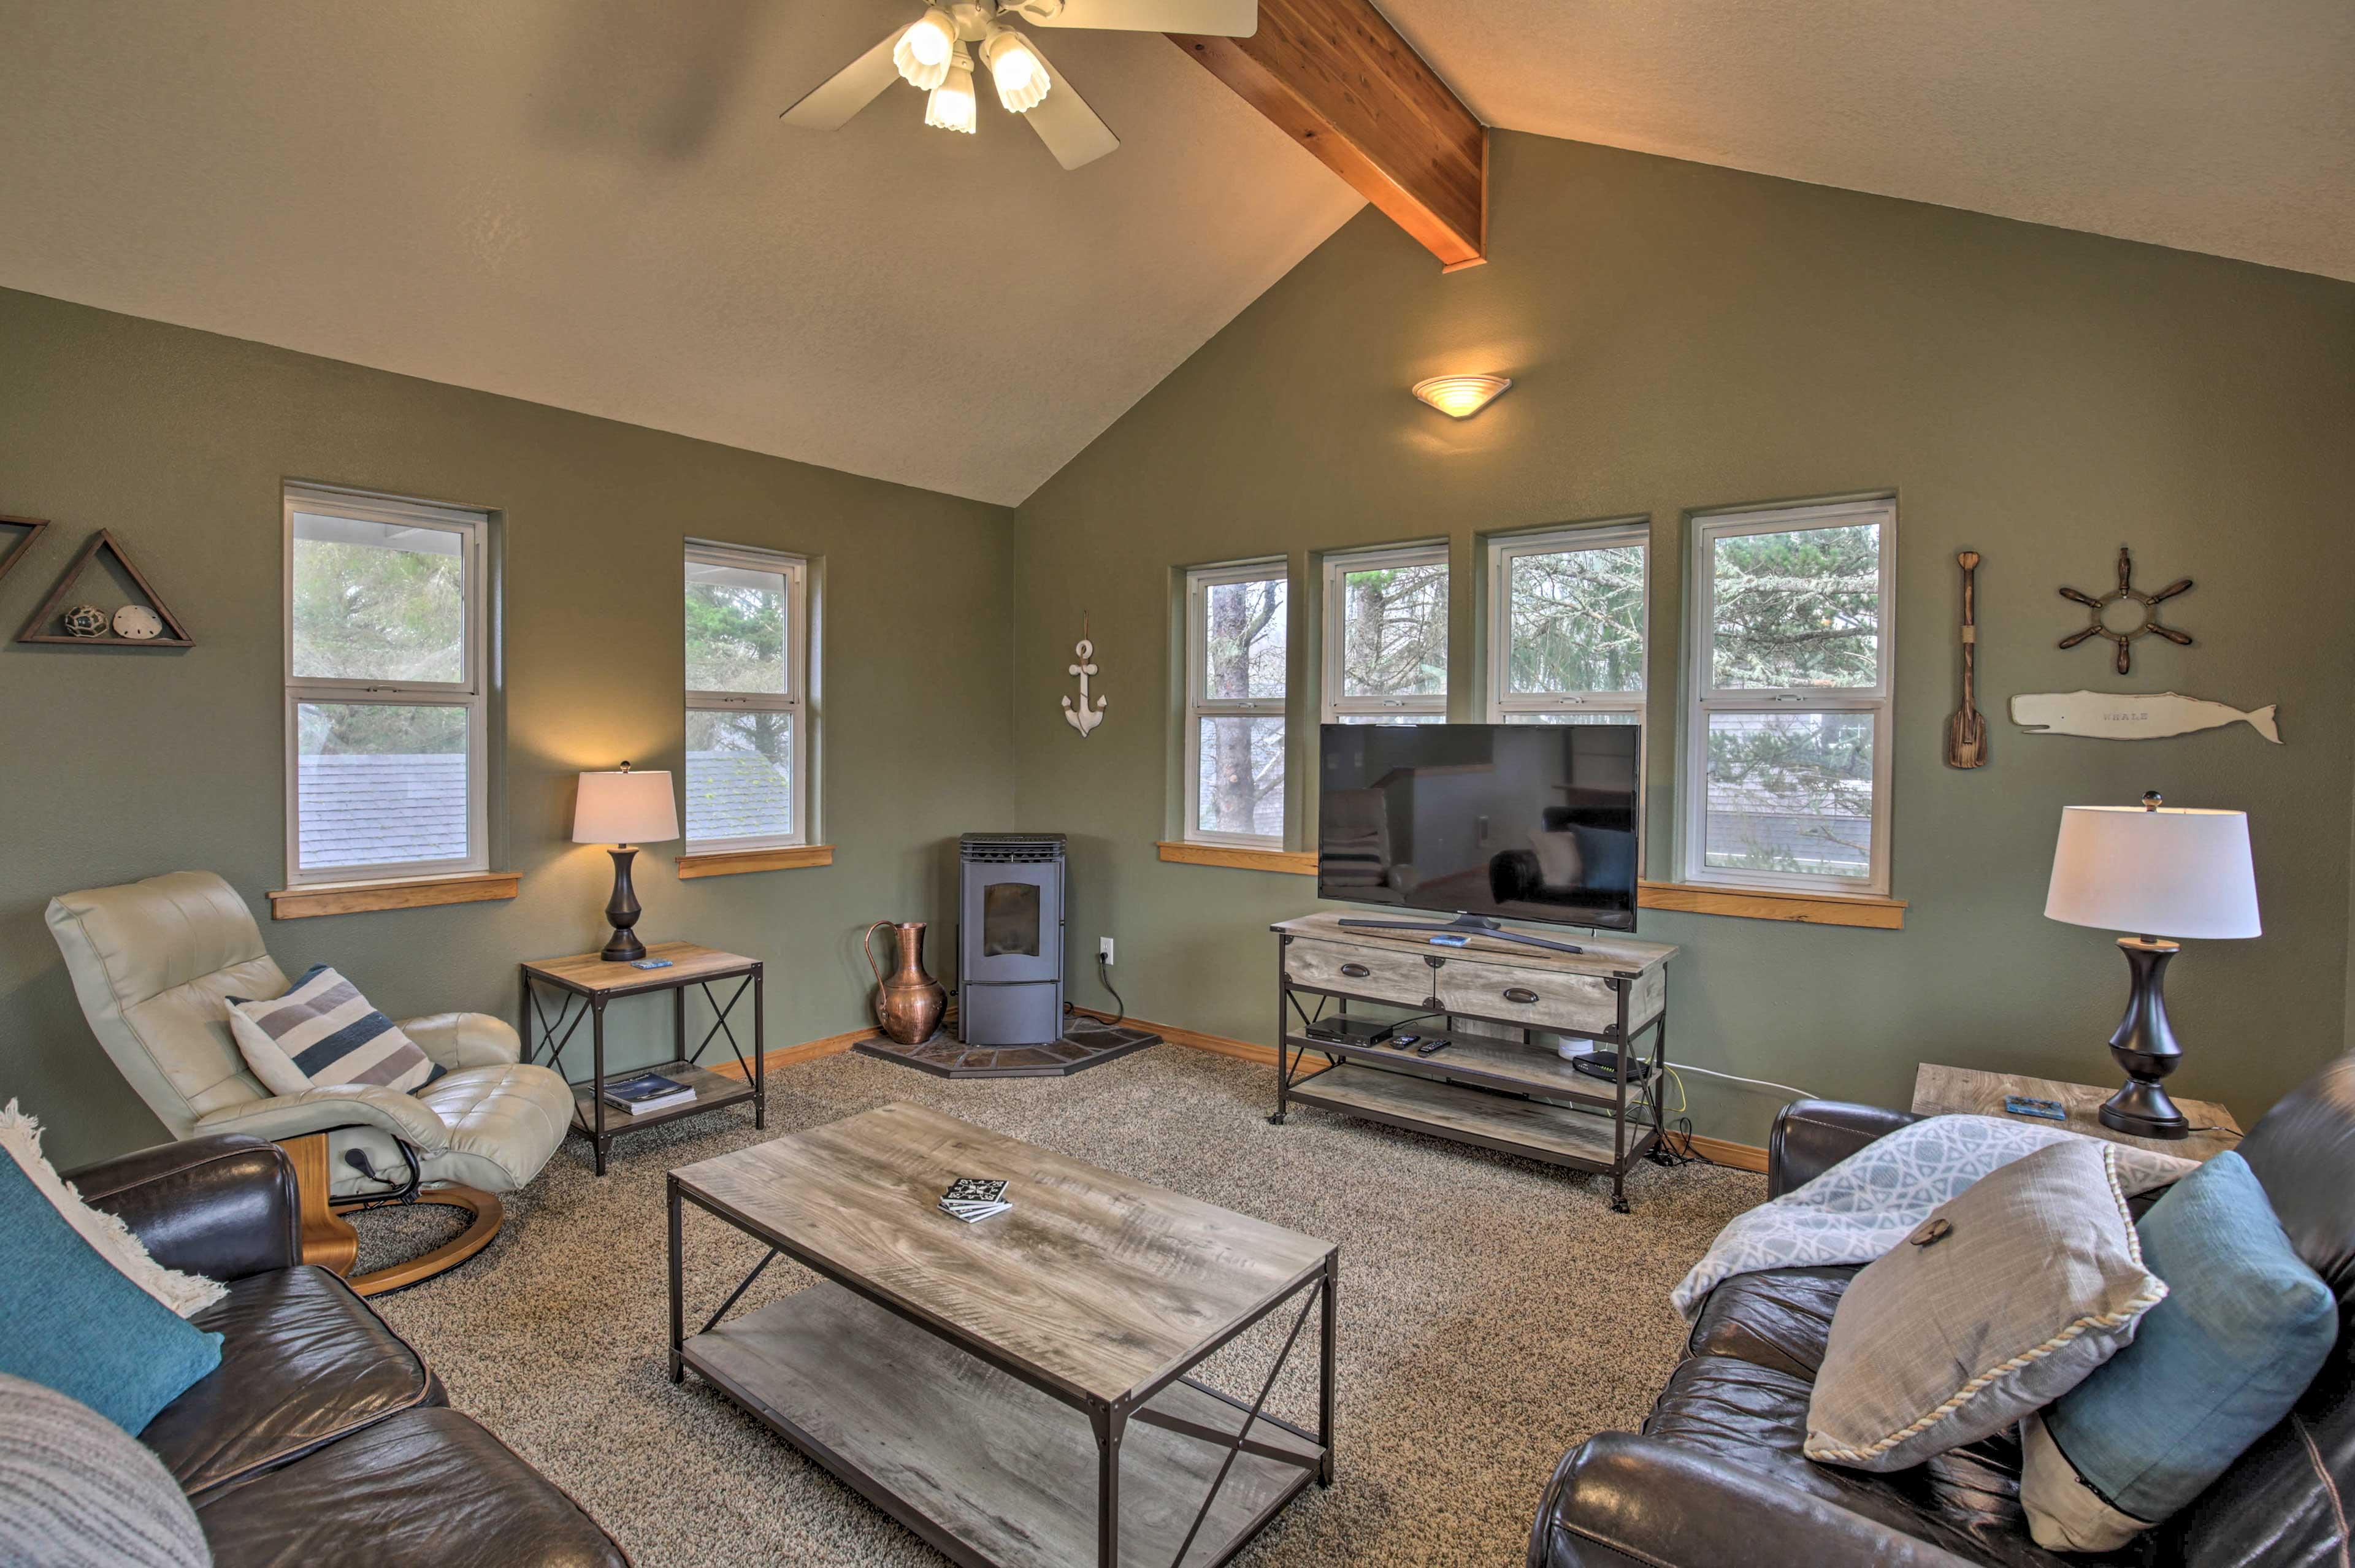 Come visit this 2-bedroom, 2-bathroom home at Rockaway Beach!